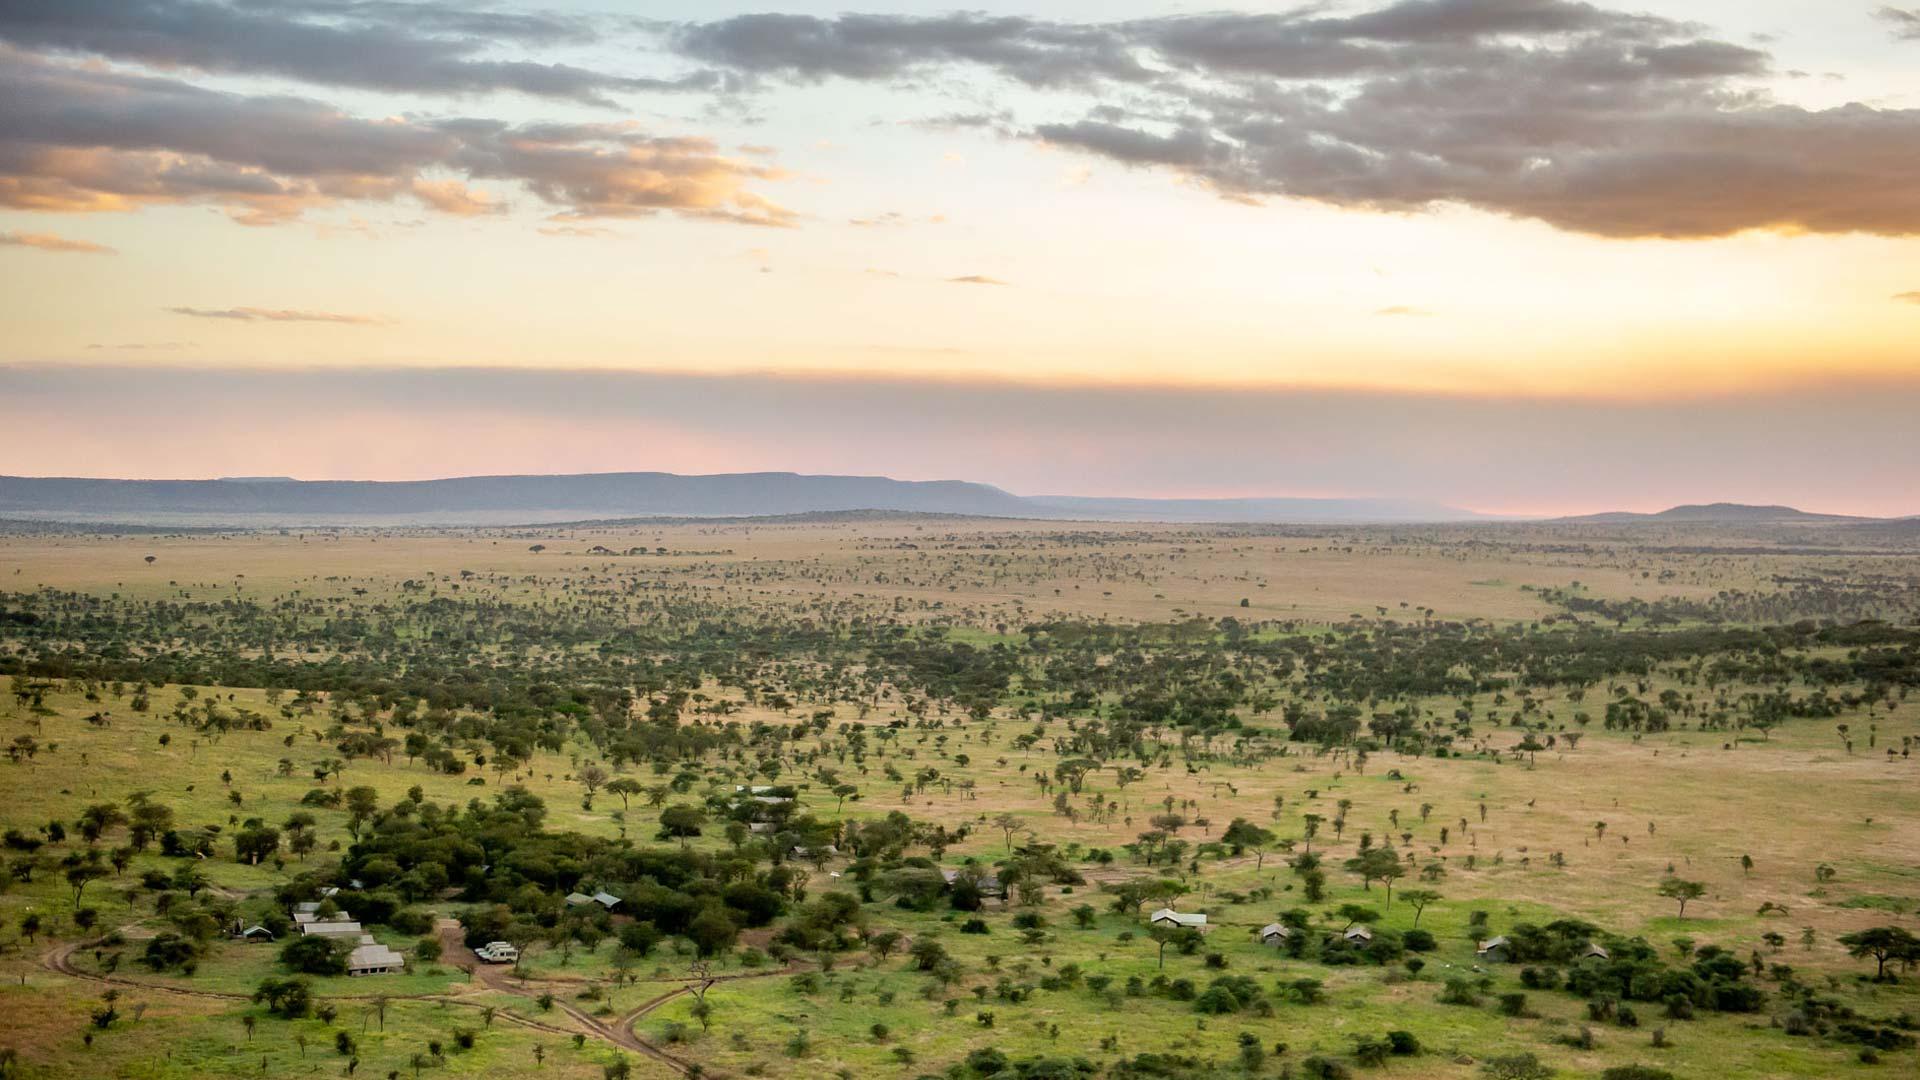 Kati Kati Mara Camp